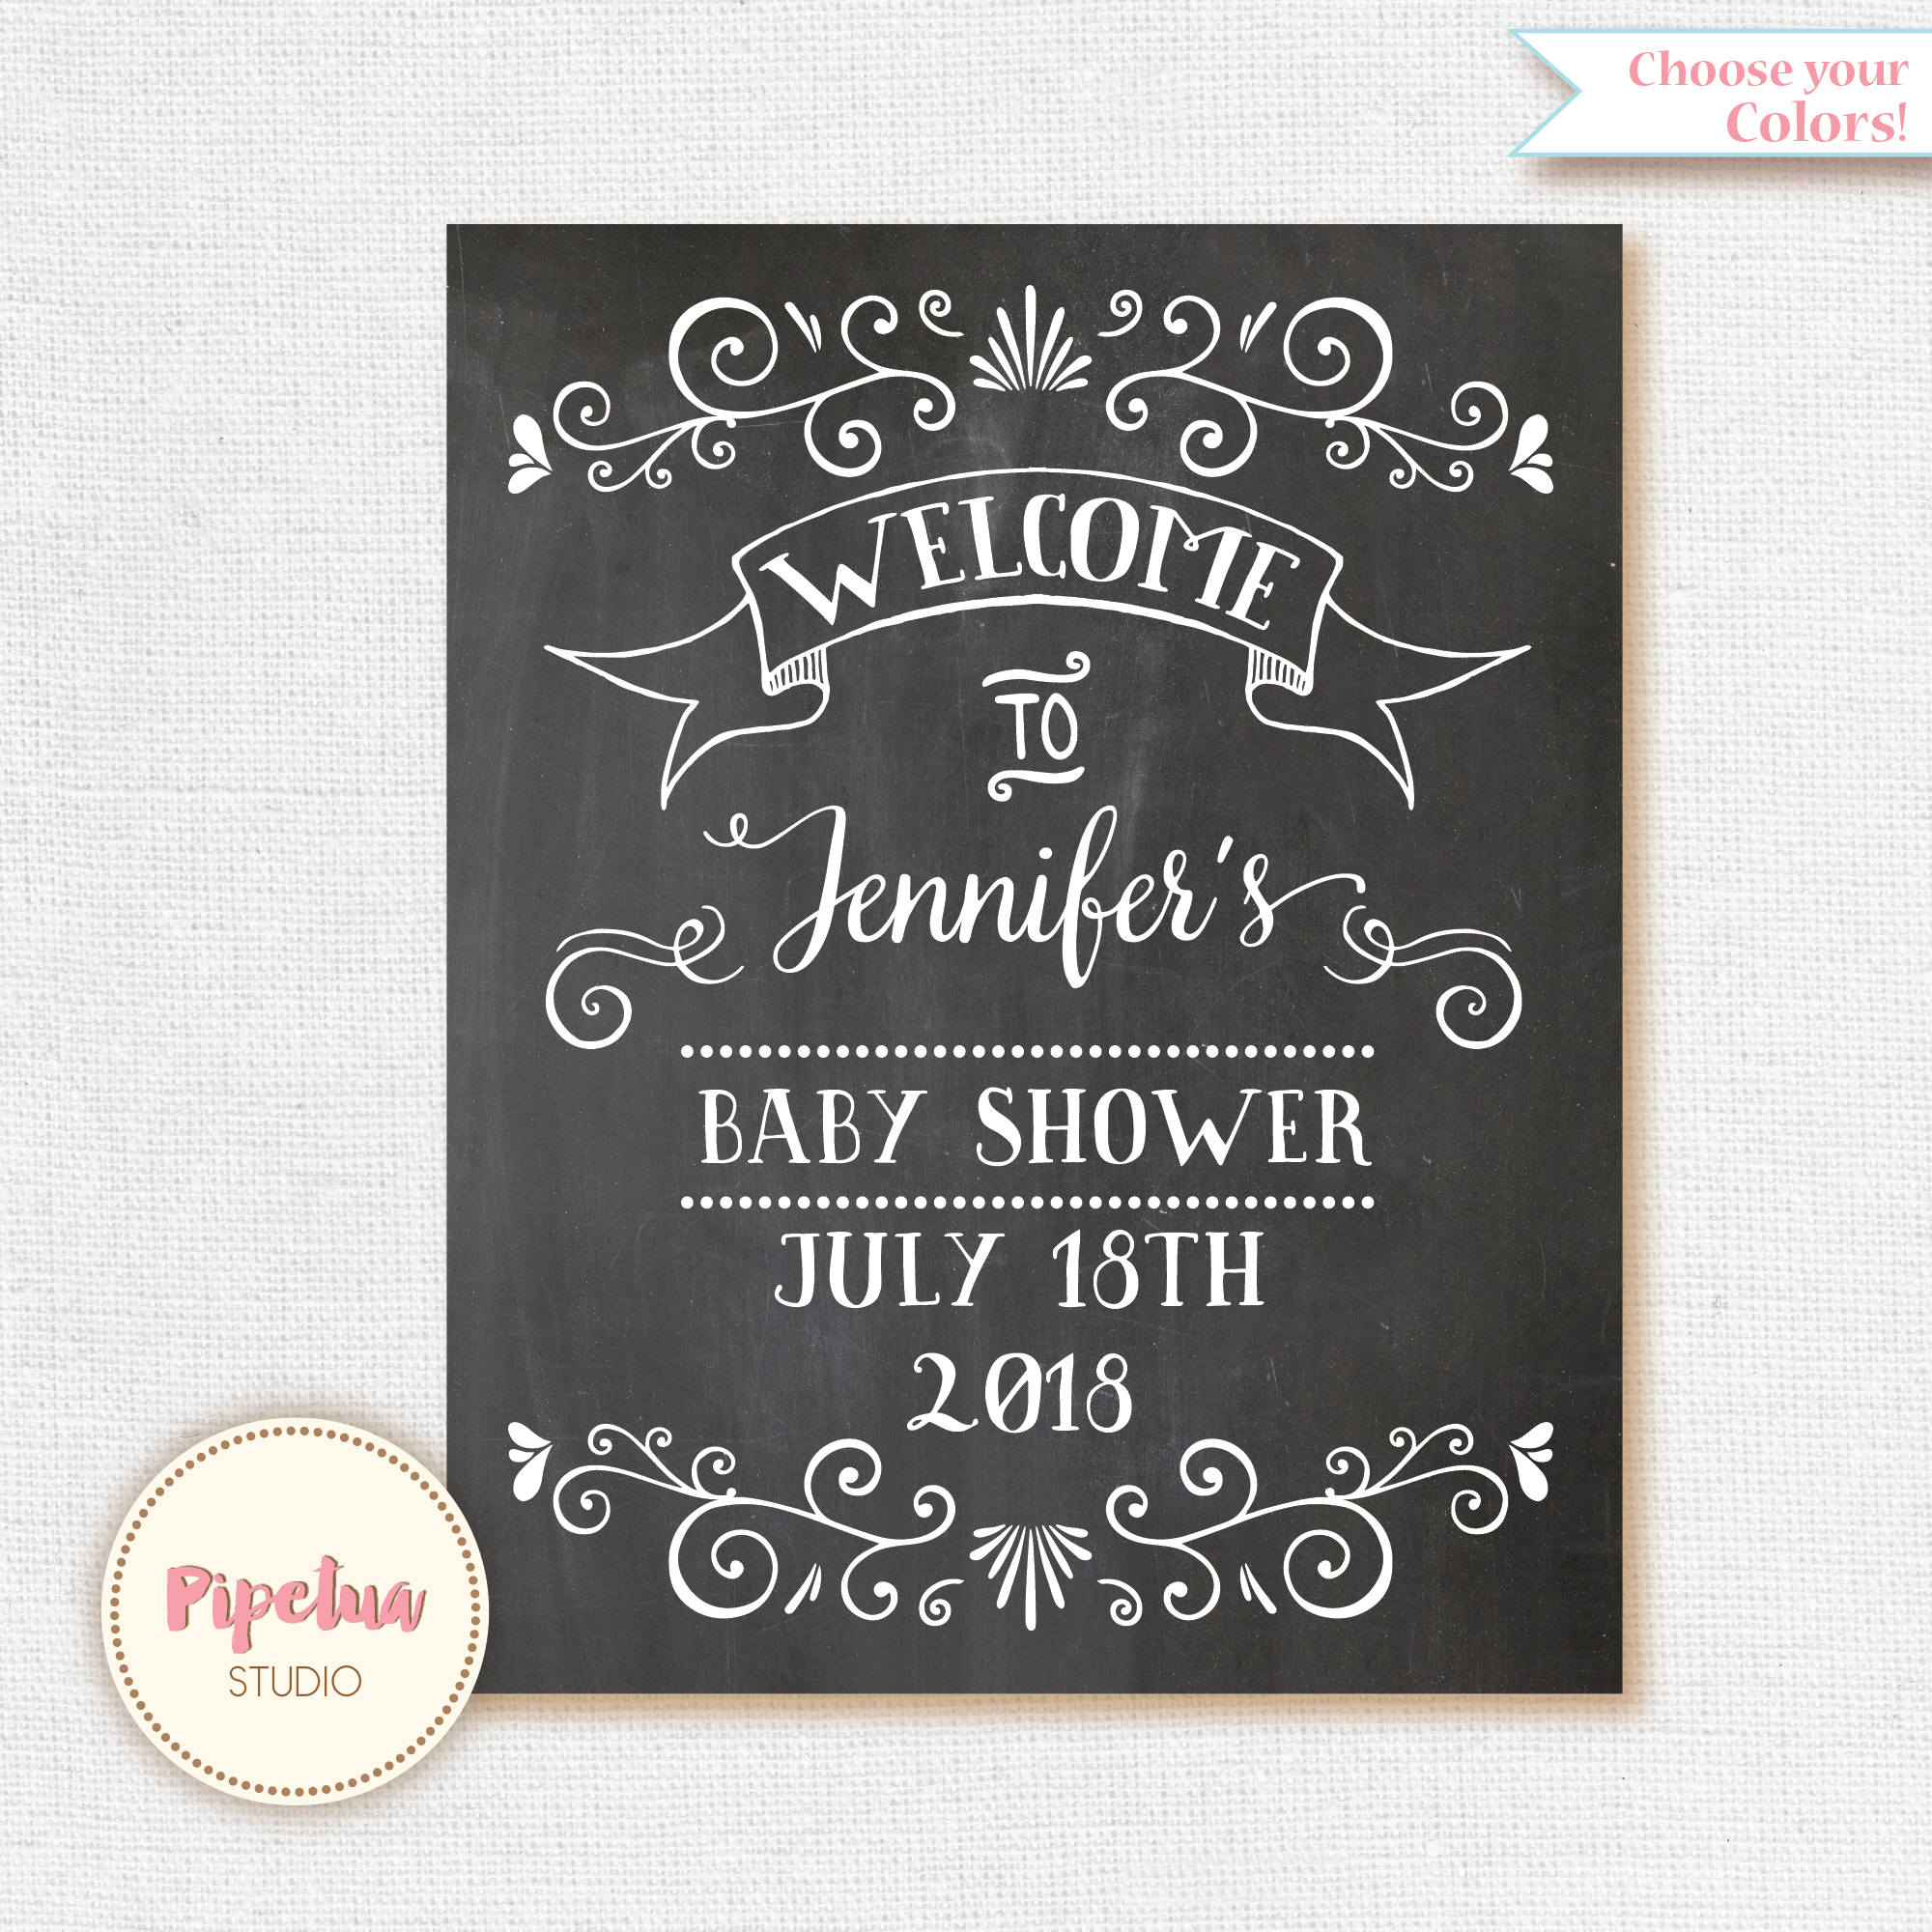 Wel e Baby Shower Sign Chalkboard Wel e sign Printable